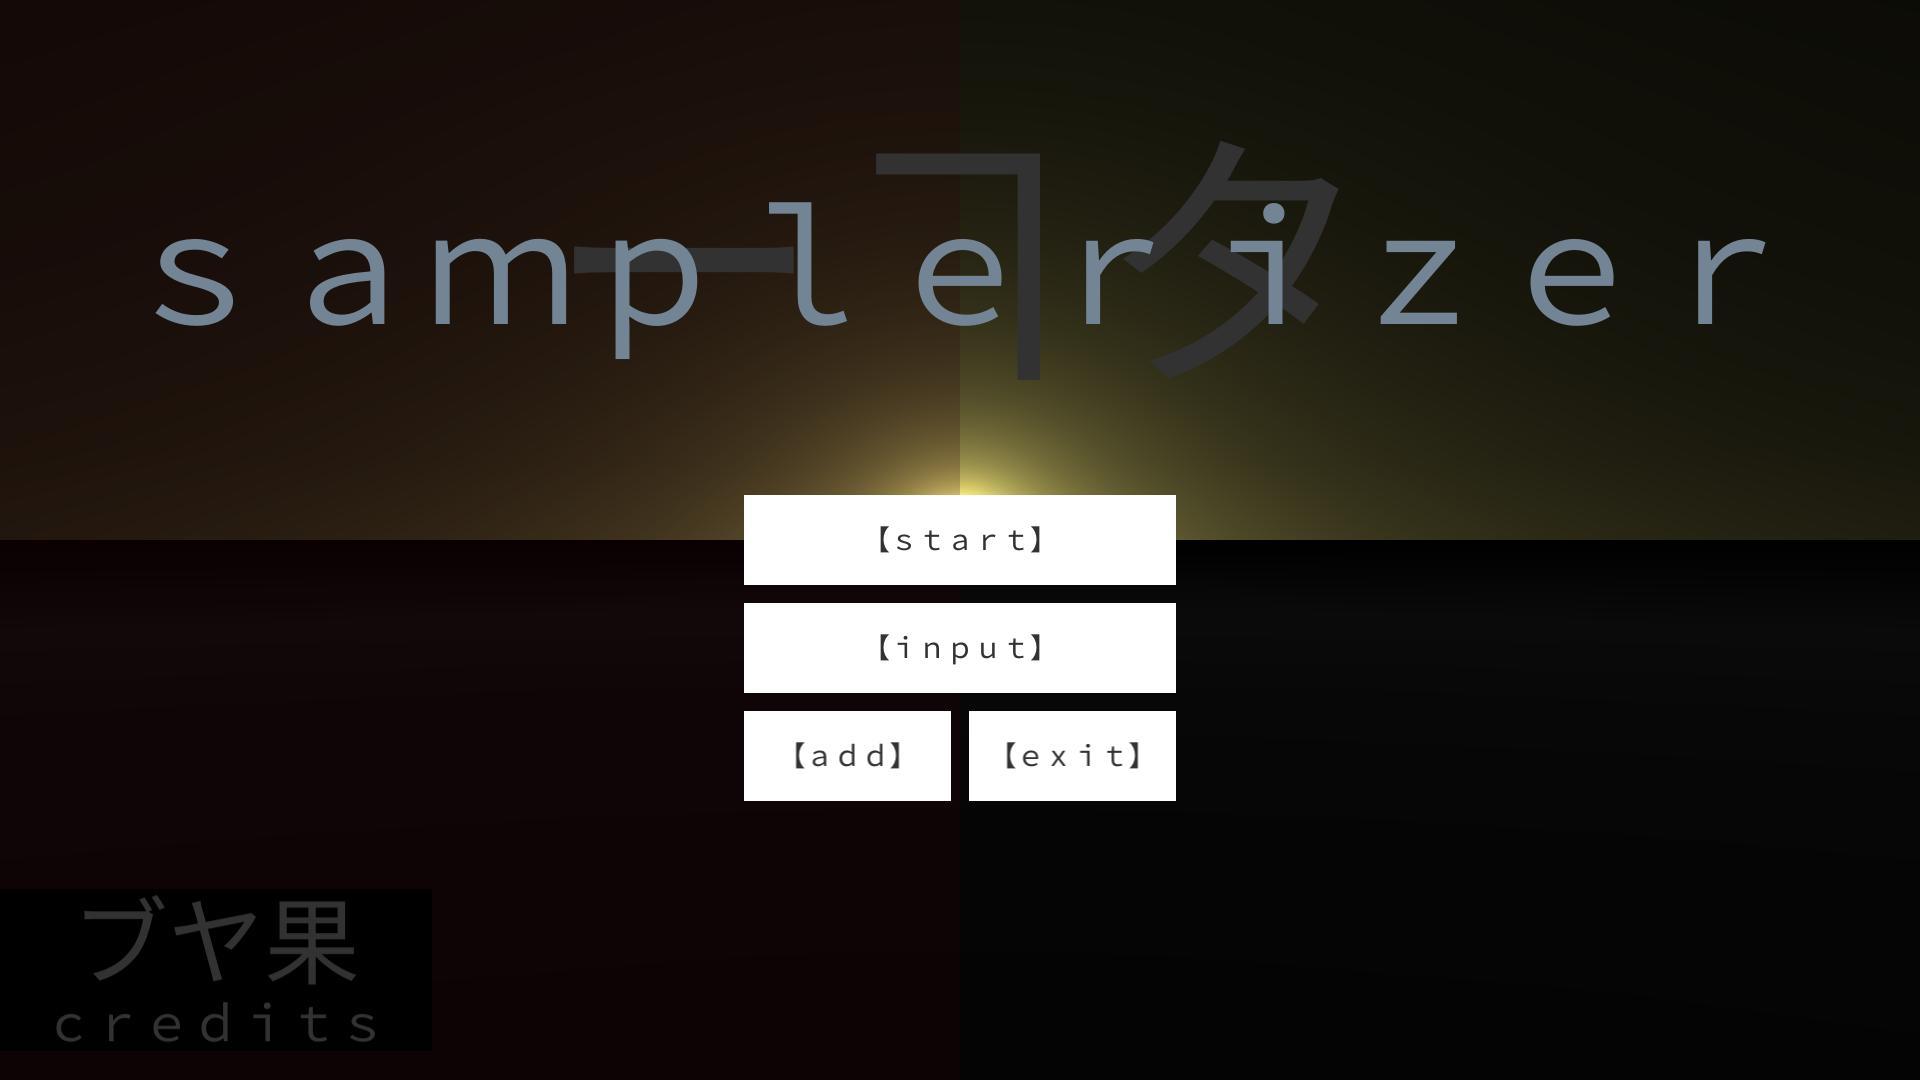 Samplerizer 1 تصوير الشاشة